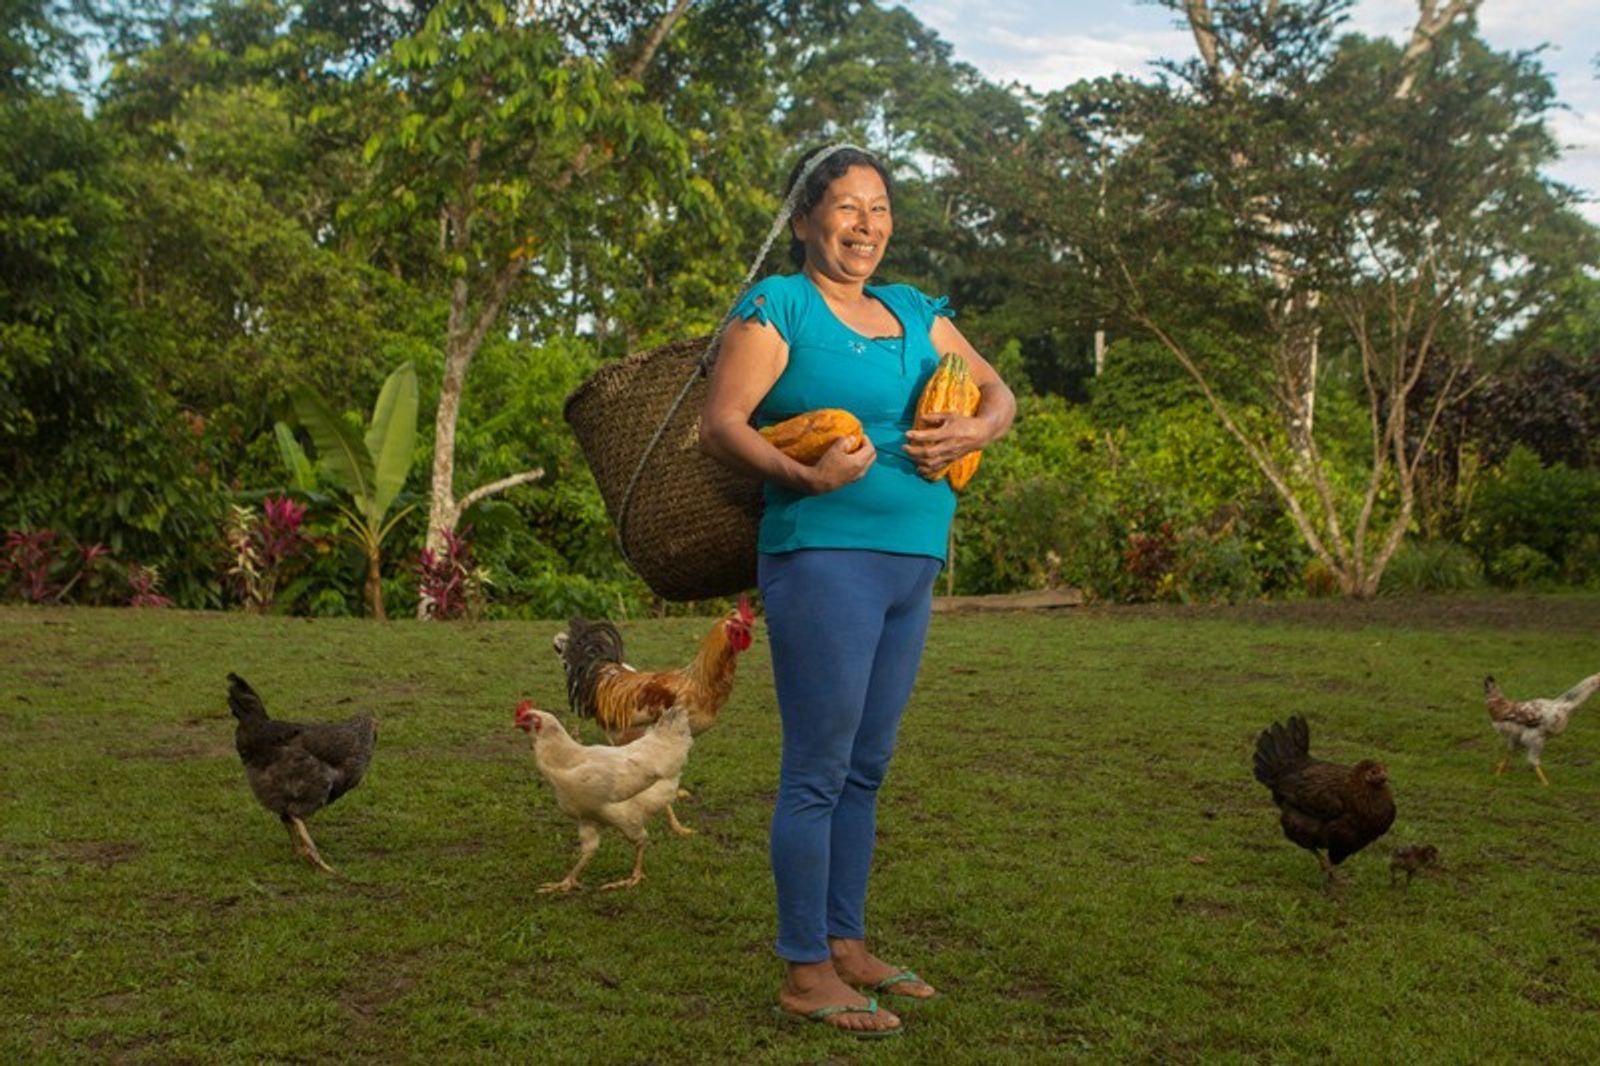 In Pictures: Cacao harvesting in Ecuador